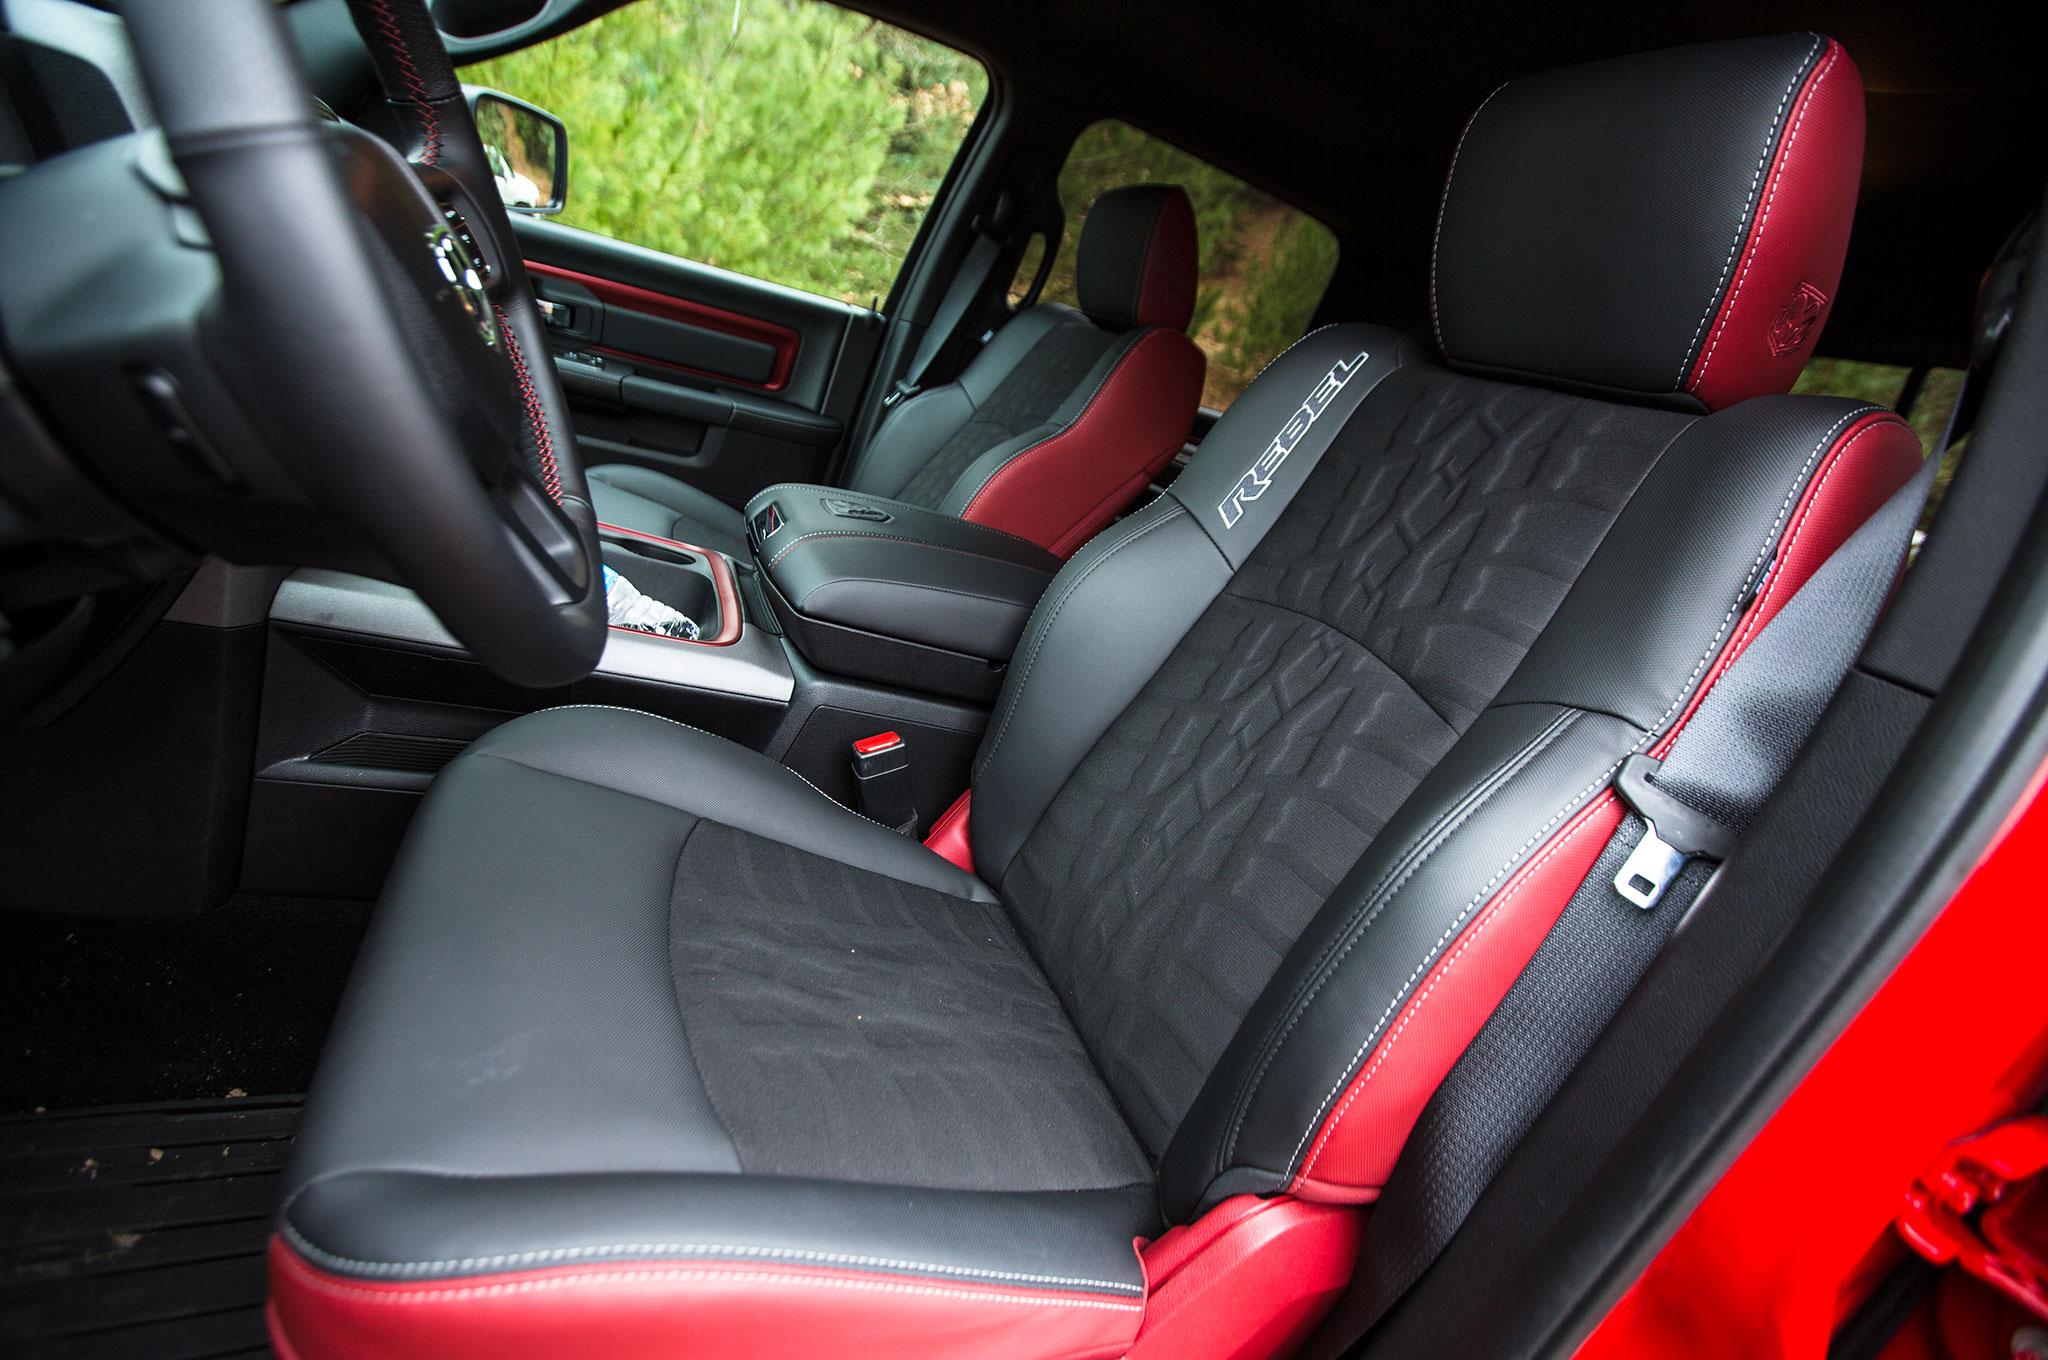 2016 ram 1500 rebel crew cab 4x4 review. Black Bedroom Furniture Sets. Home Design Ideas